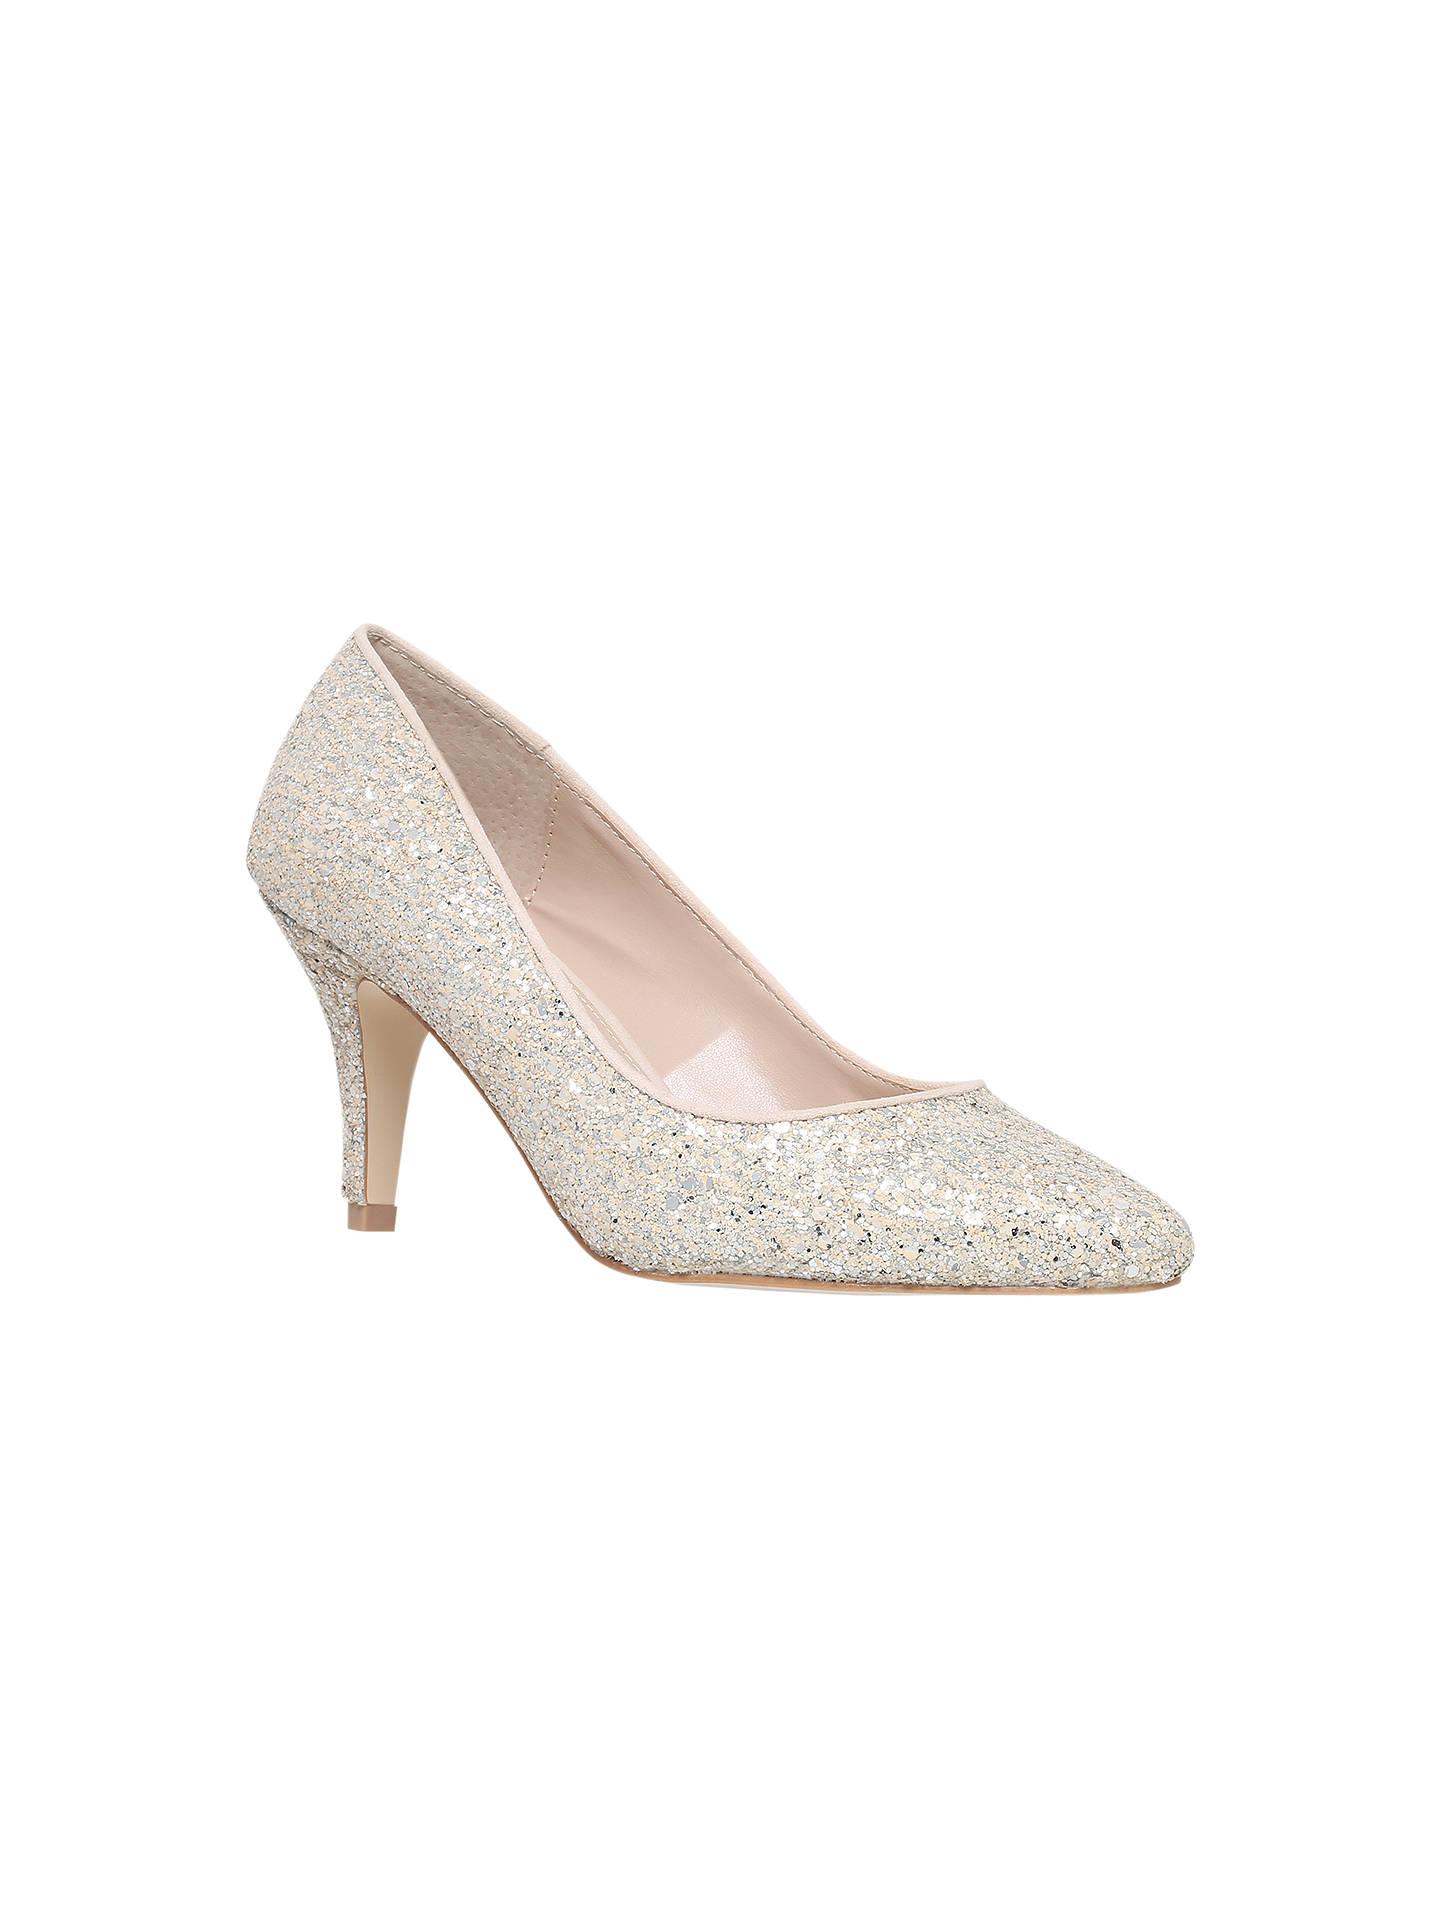 a4f263b9cc8 Carvela Kairo Glitter Court Shoes, Silver at John Lewis & Partners